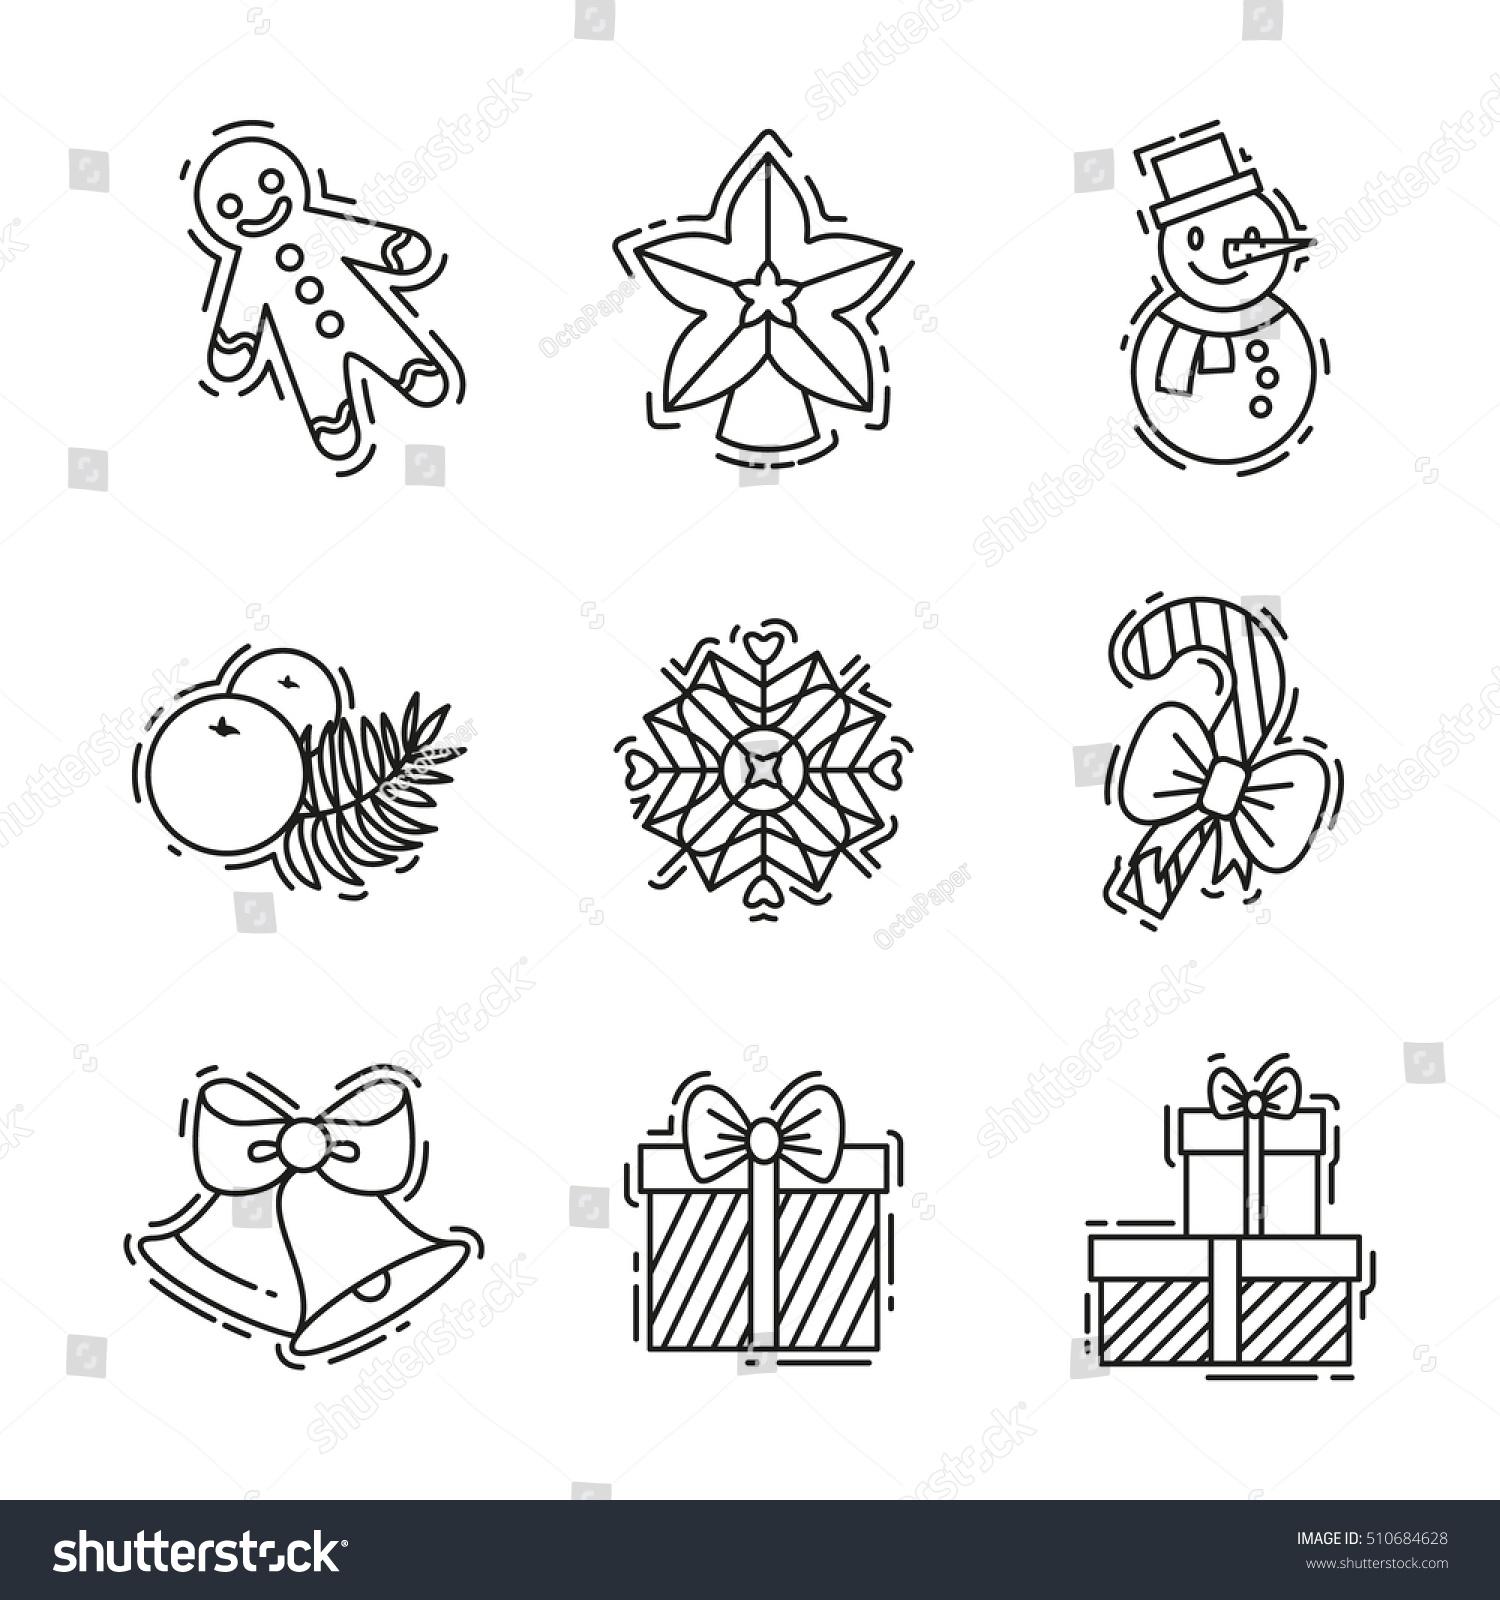 Christmas Icons Set Vector Outline Colour Stock Vector 510684628 ...